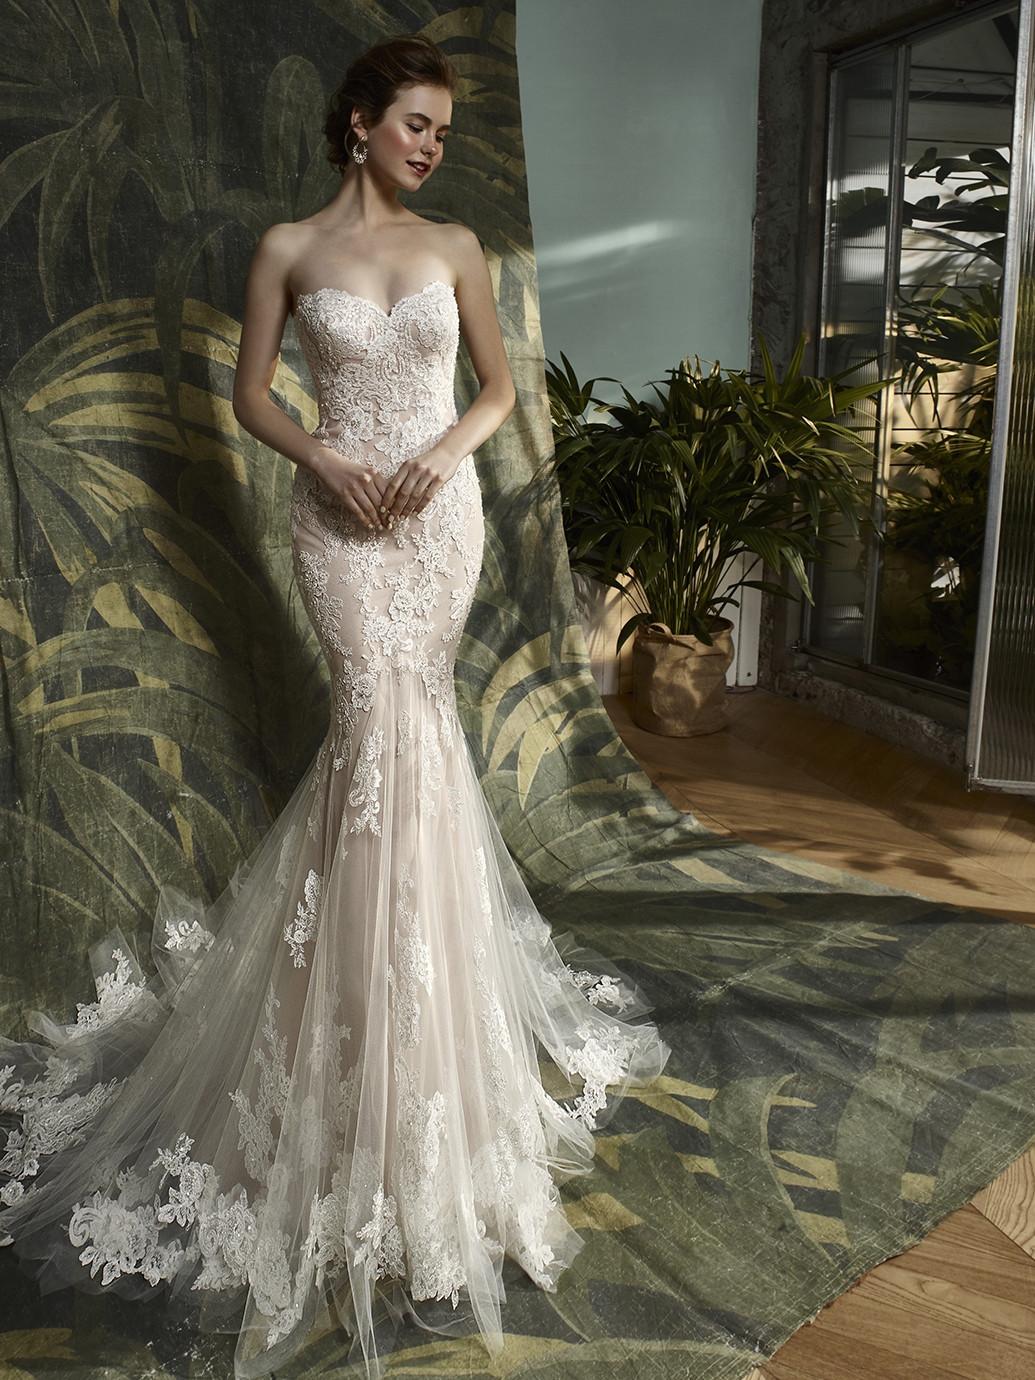 Katerina mermaid wedding dress by blue by enzoani Wedding dress design tool